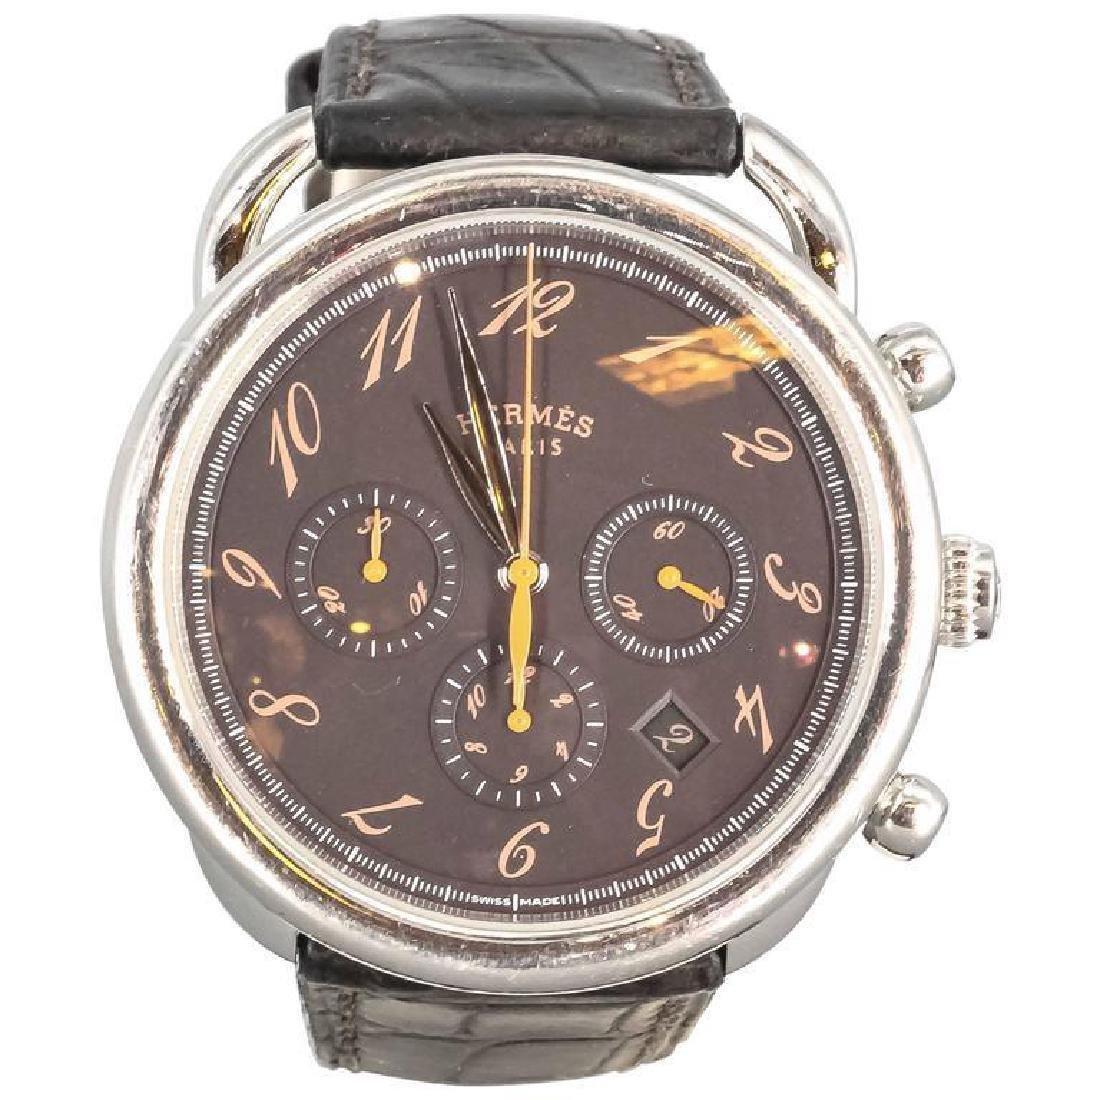 Hermes Stainless Steel Arceau Chronograph Wristwatch